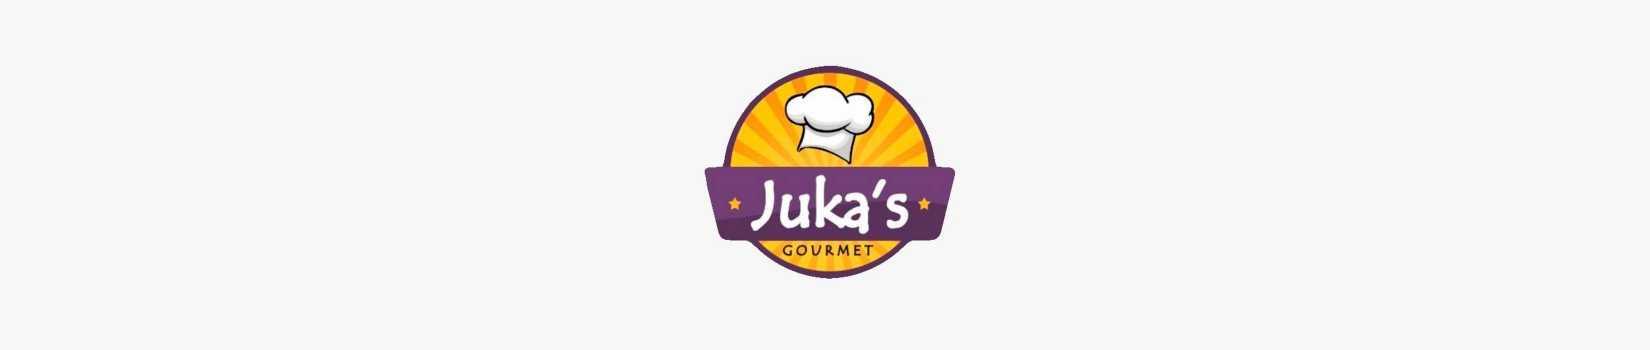 Jukas Gourmet